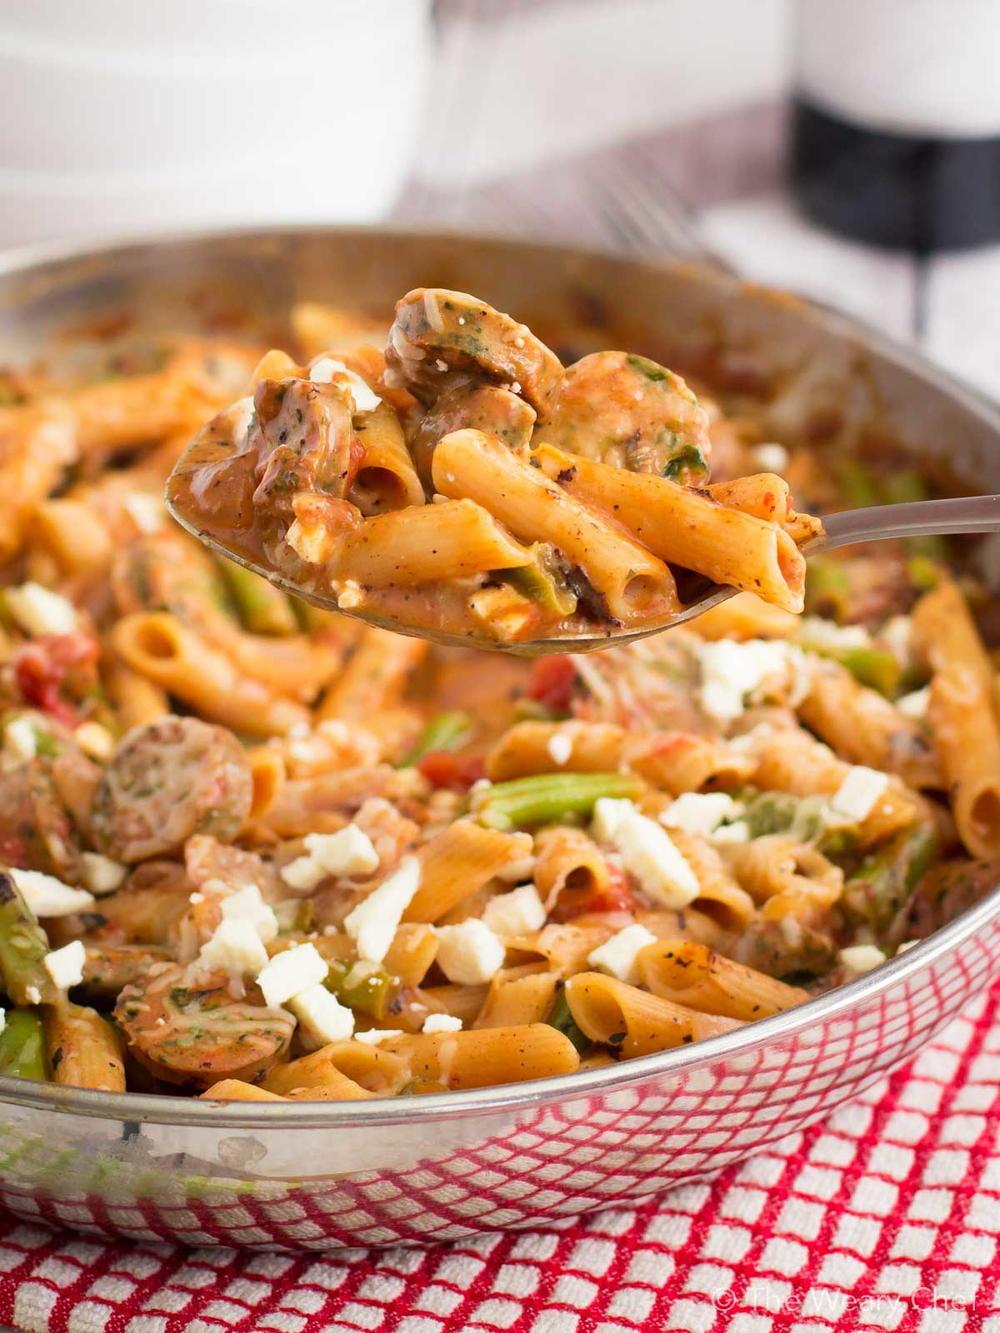 Italian Sausage Pasta Recipes  Easy Italian Sausage Pasta Skillet Recipe